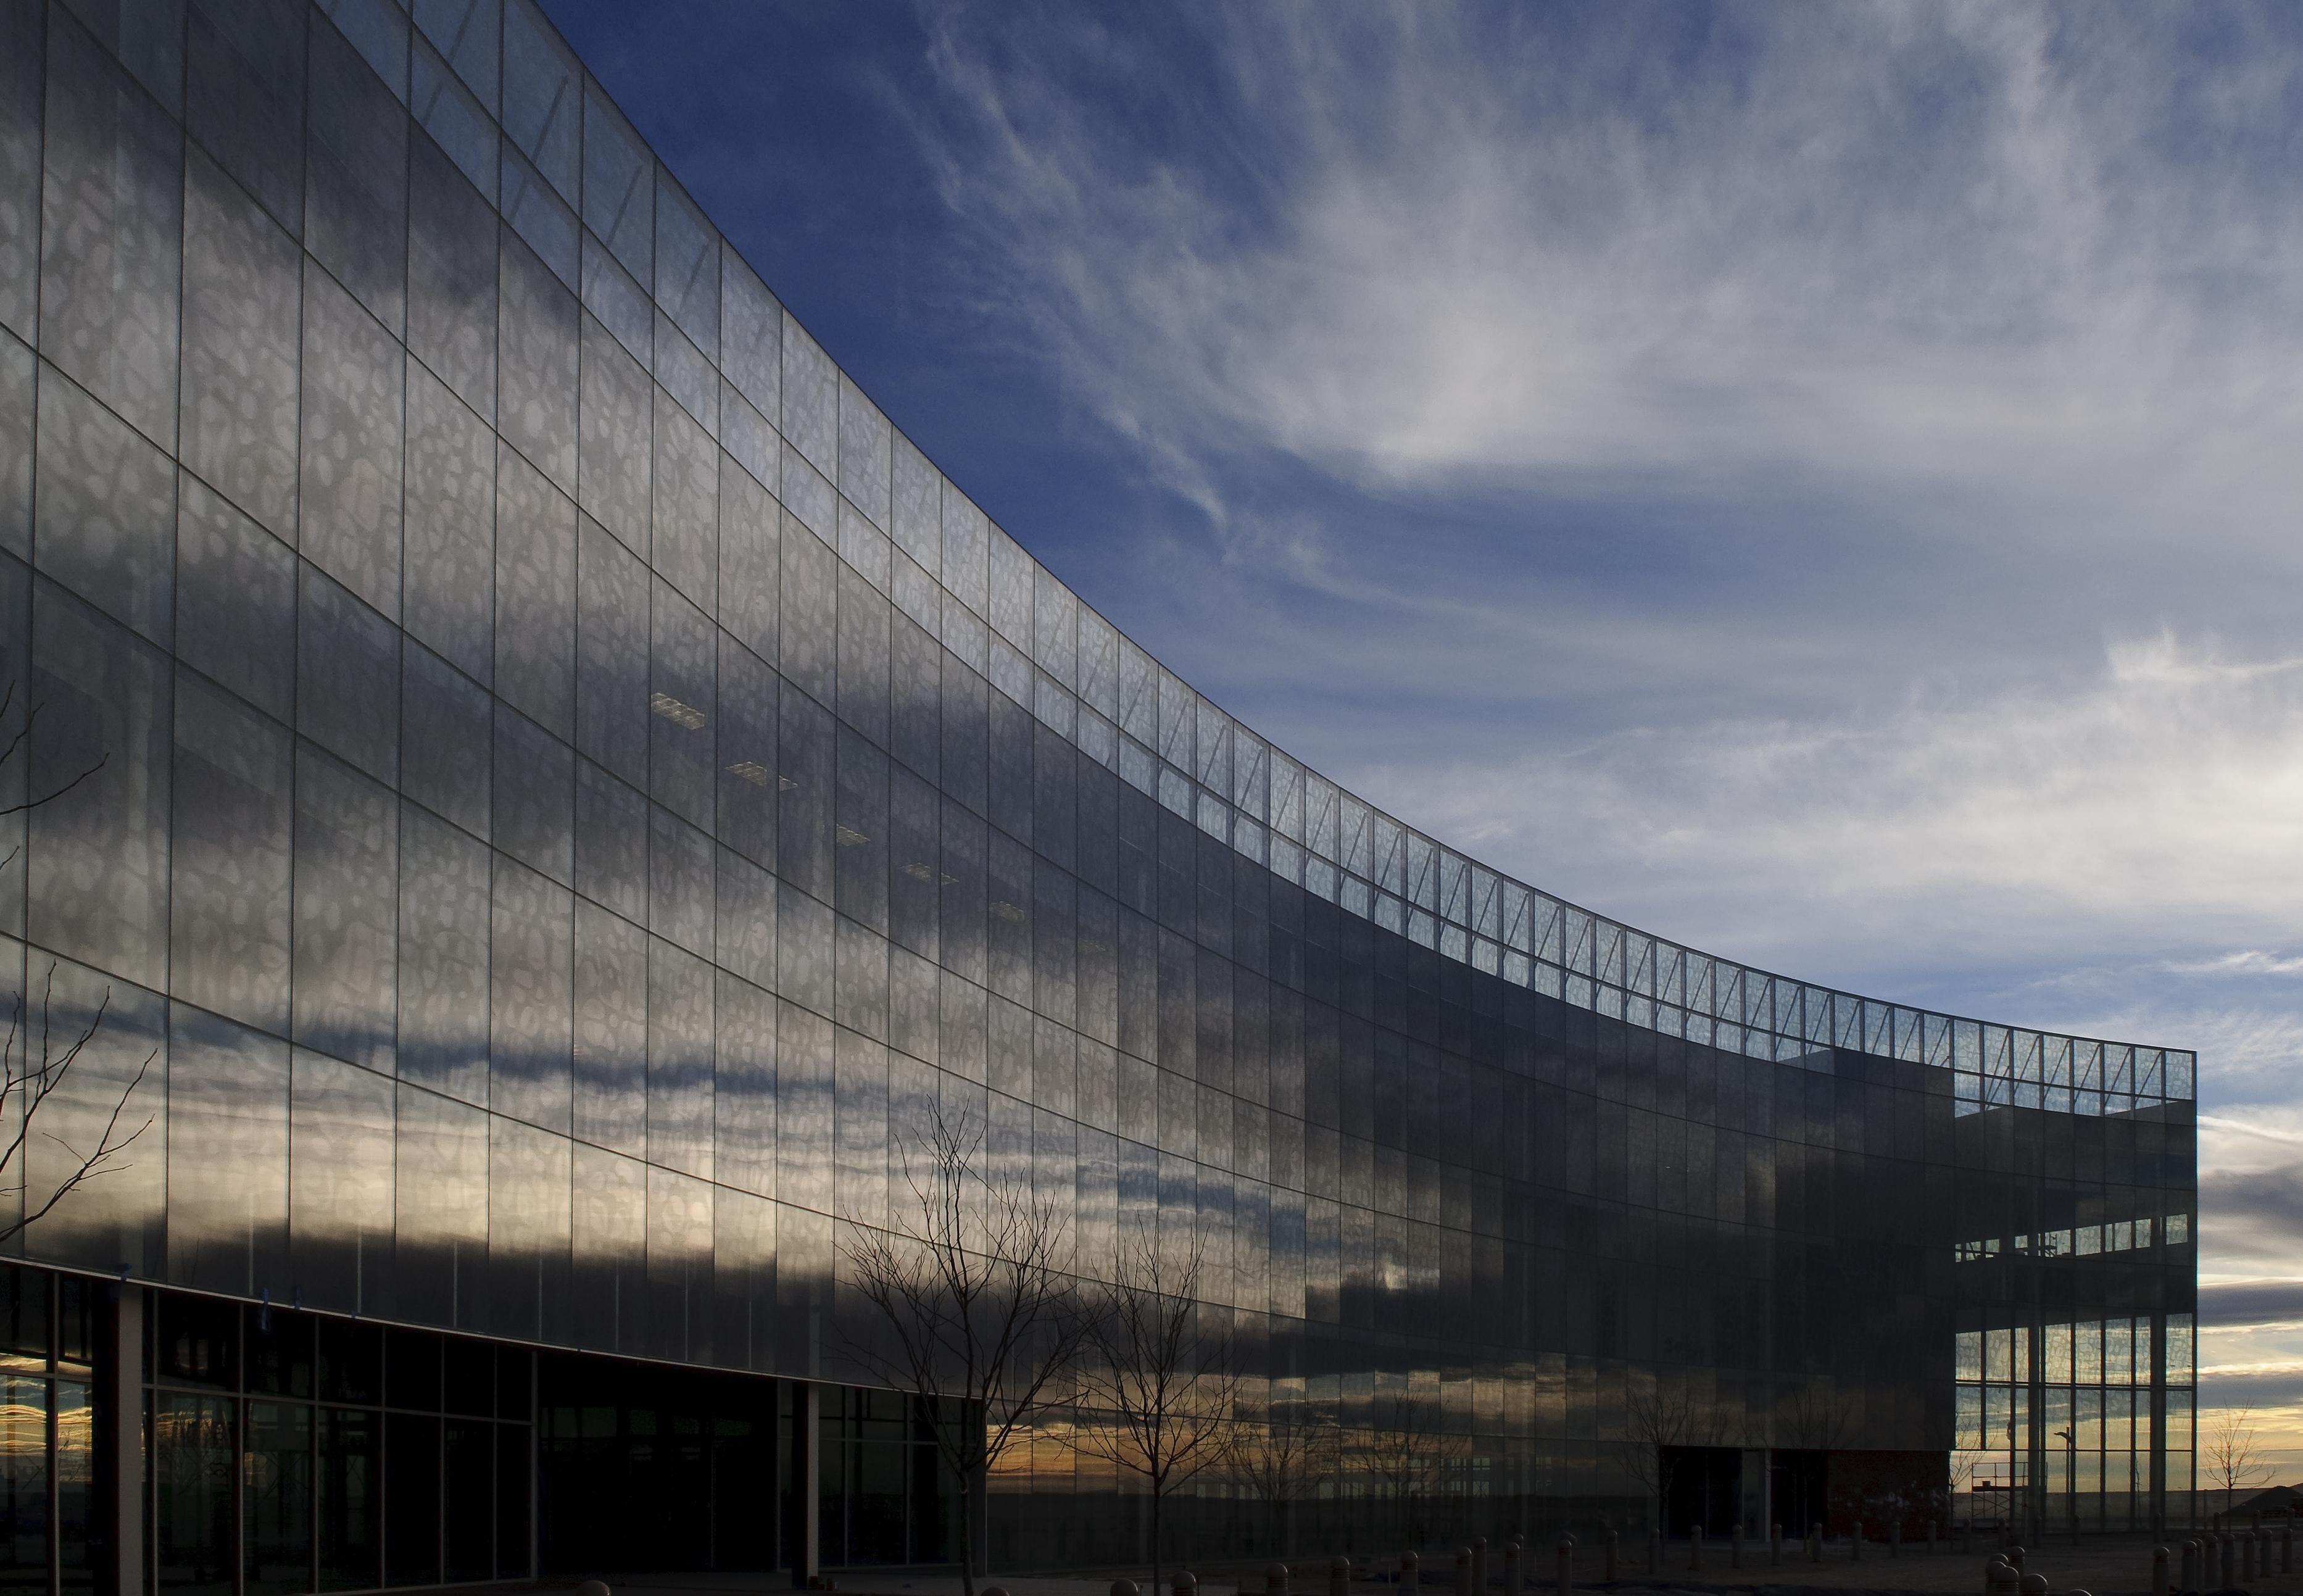 Mesa Del Sol Town Square, Albuquerque, New Mexico   Glazing contractor: Southwest Glass and Glazing   Architect: Antoine Predock Architects. PC   Glass: PPG Solarban 60 with custom silkscreen (Bone Marrow)